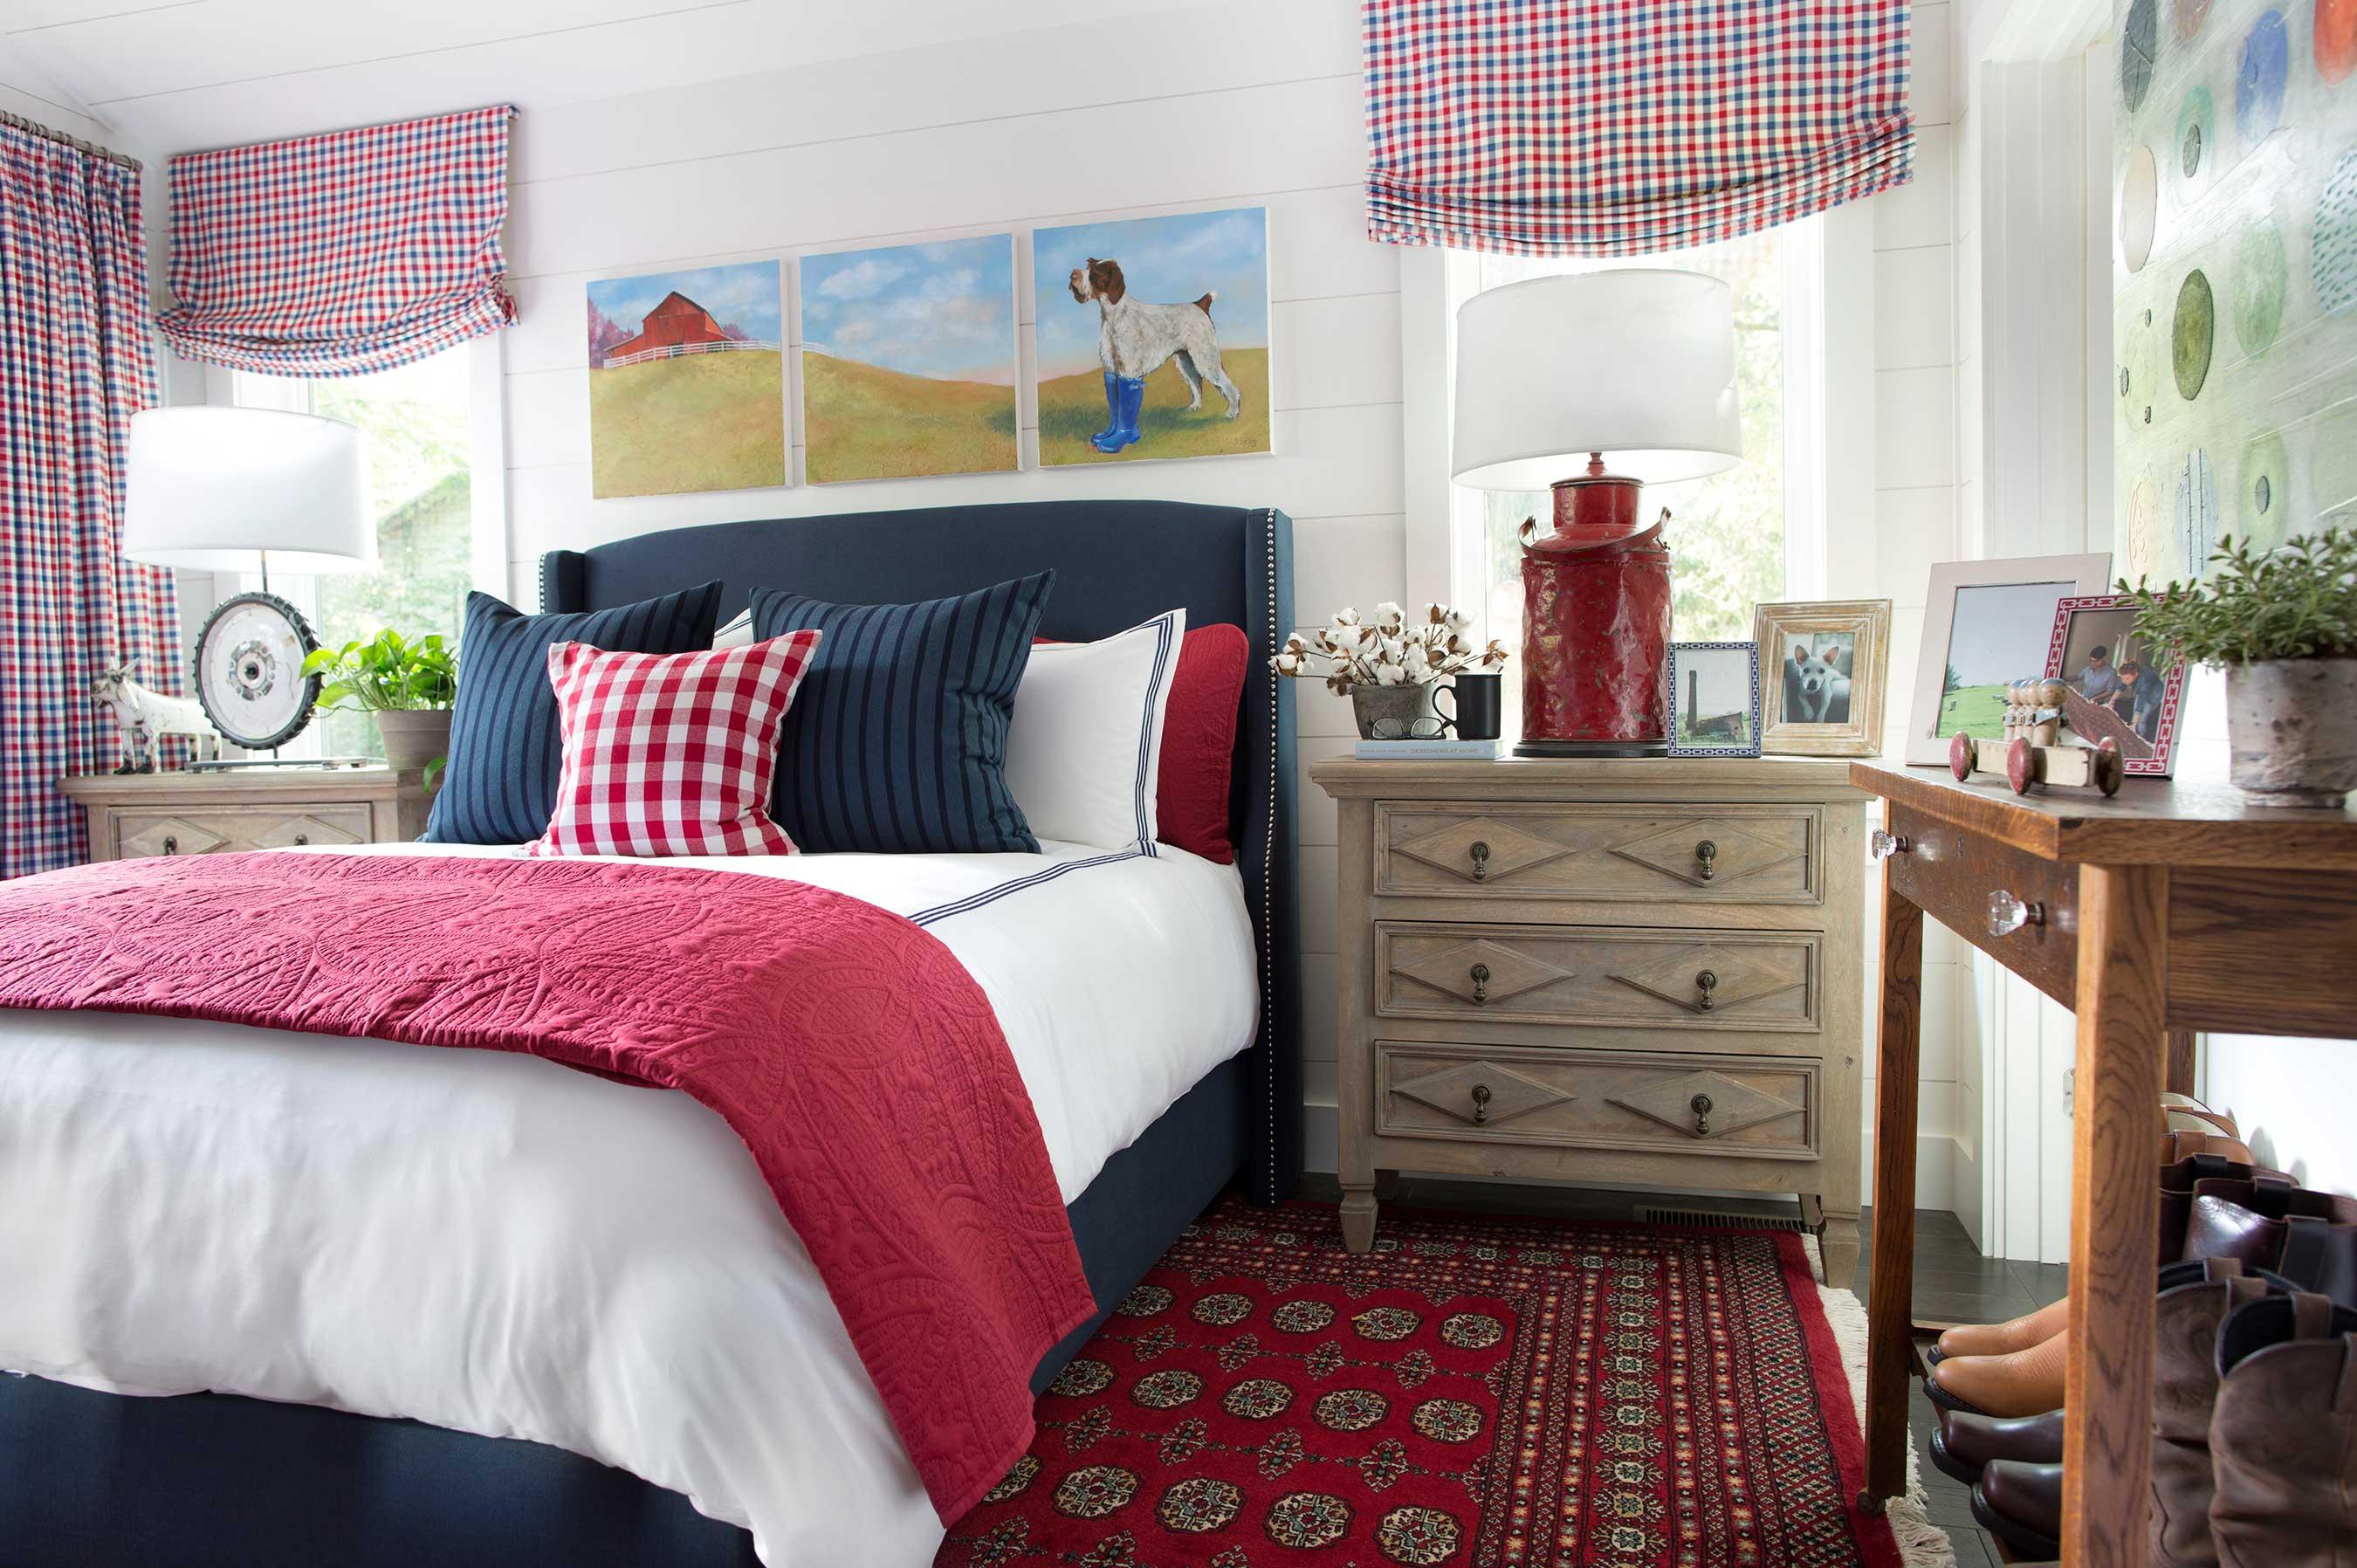 Hgtv urban oasis giveaway 2015 now open for entries Urban farmhouse master bedroom